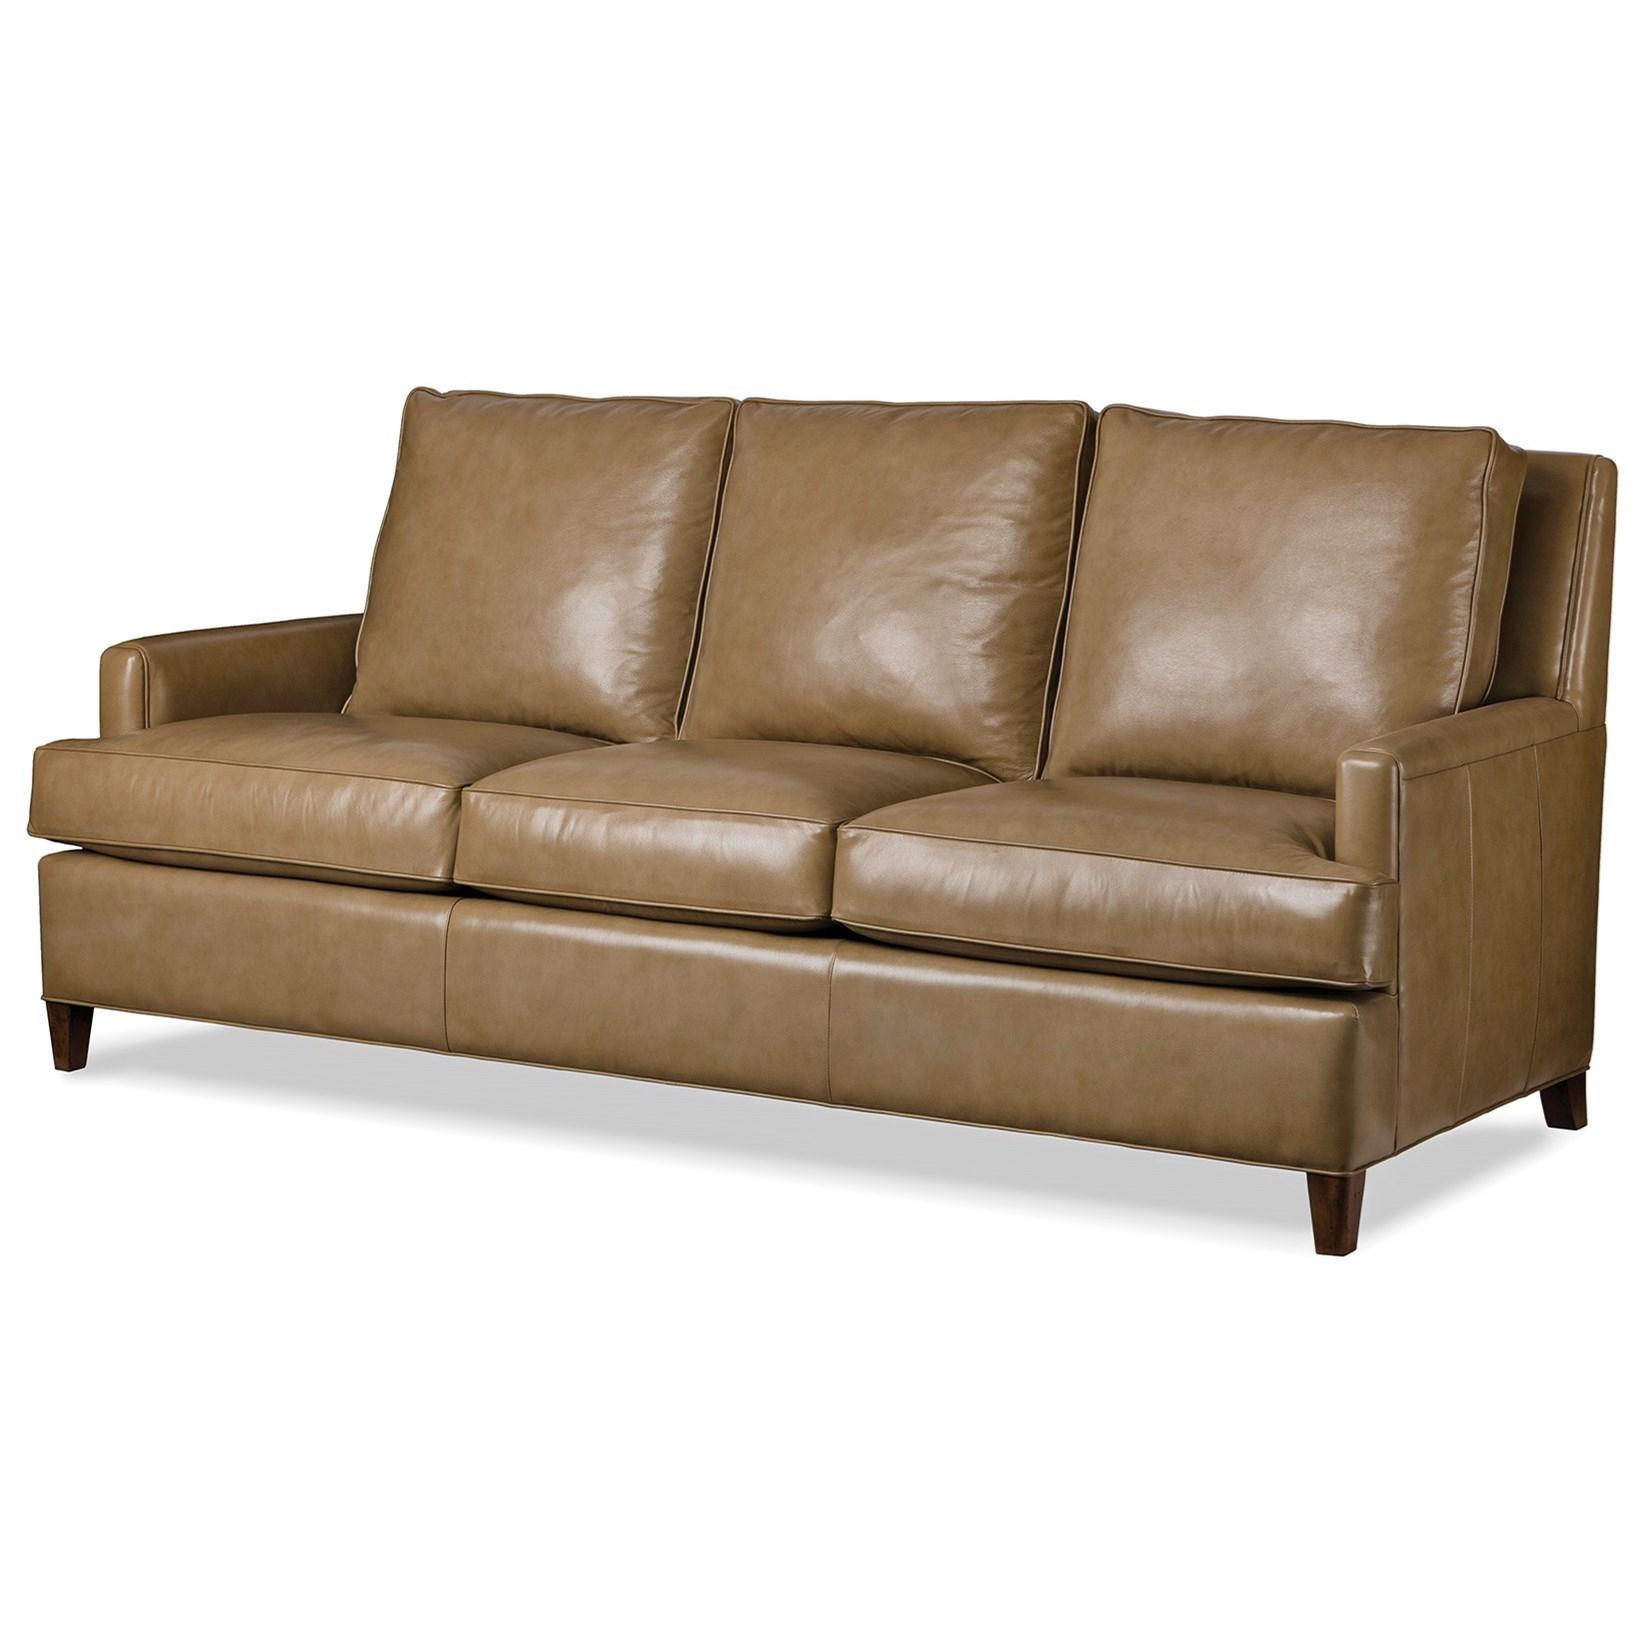 Ordinaire Hancock U0026 Moore Ricki Contemporary Leather Sofa